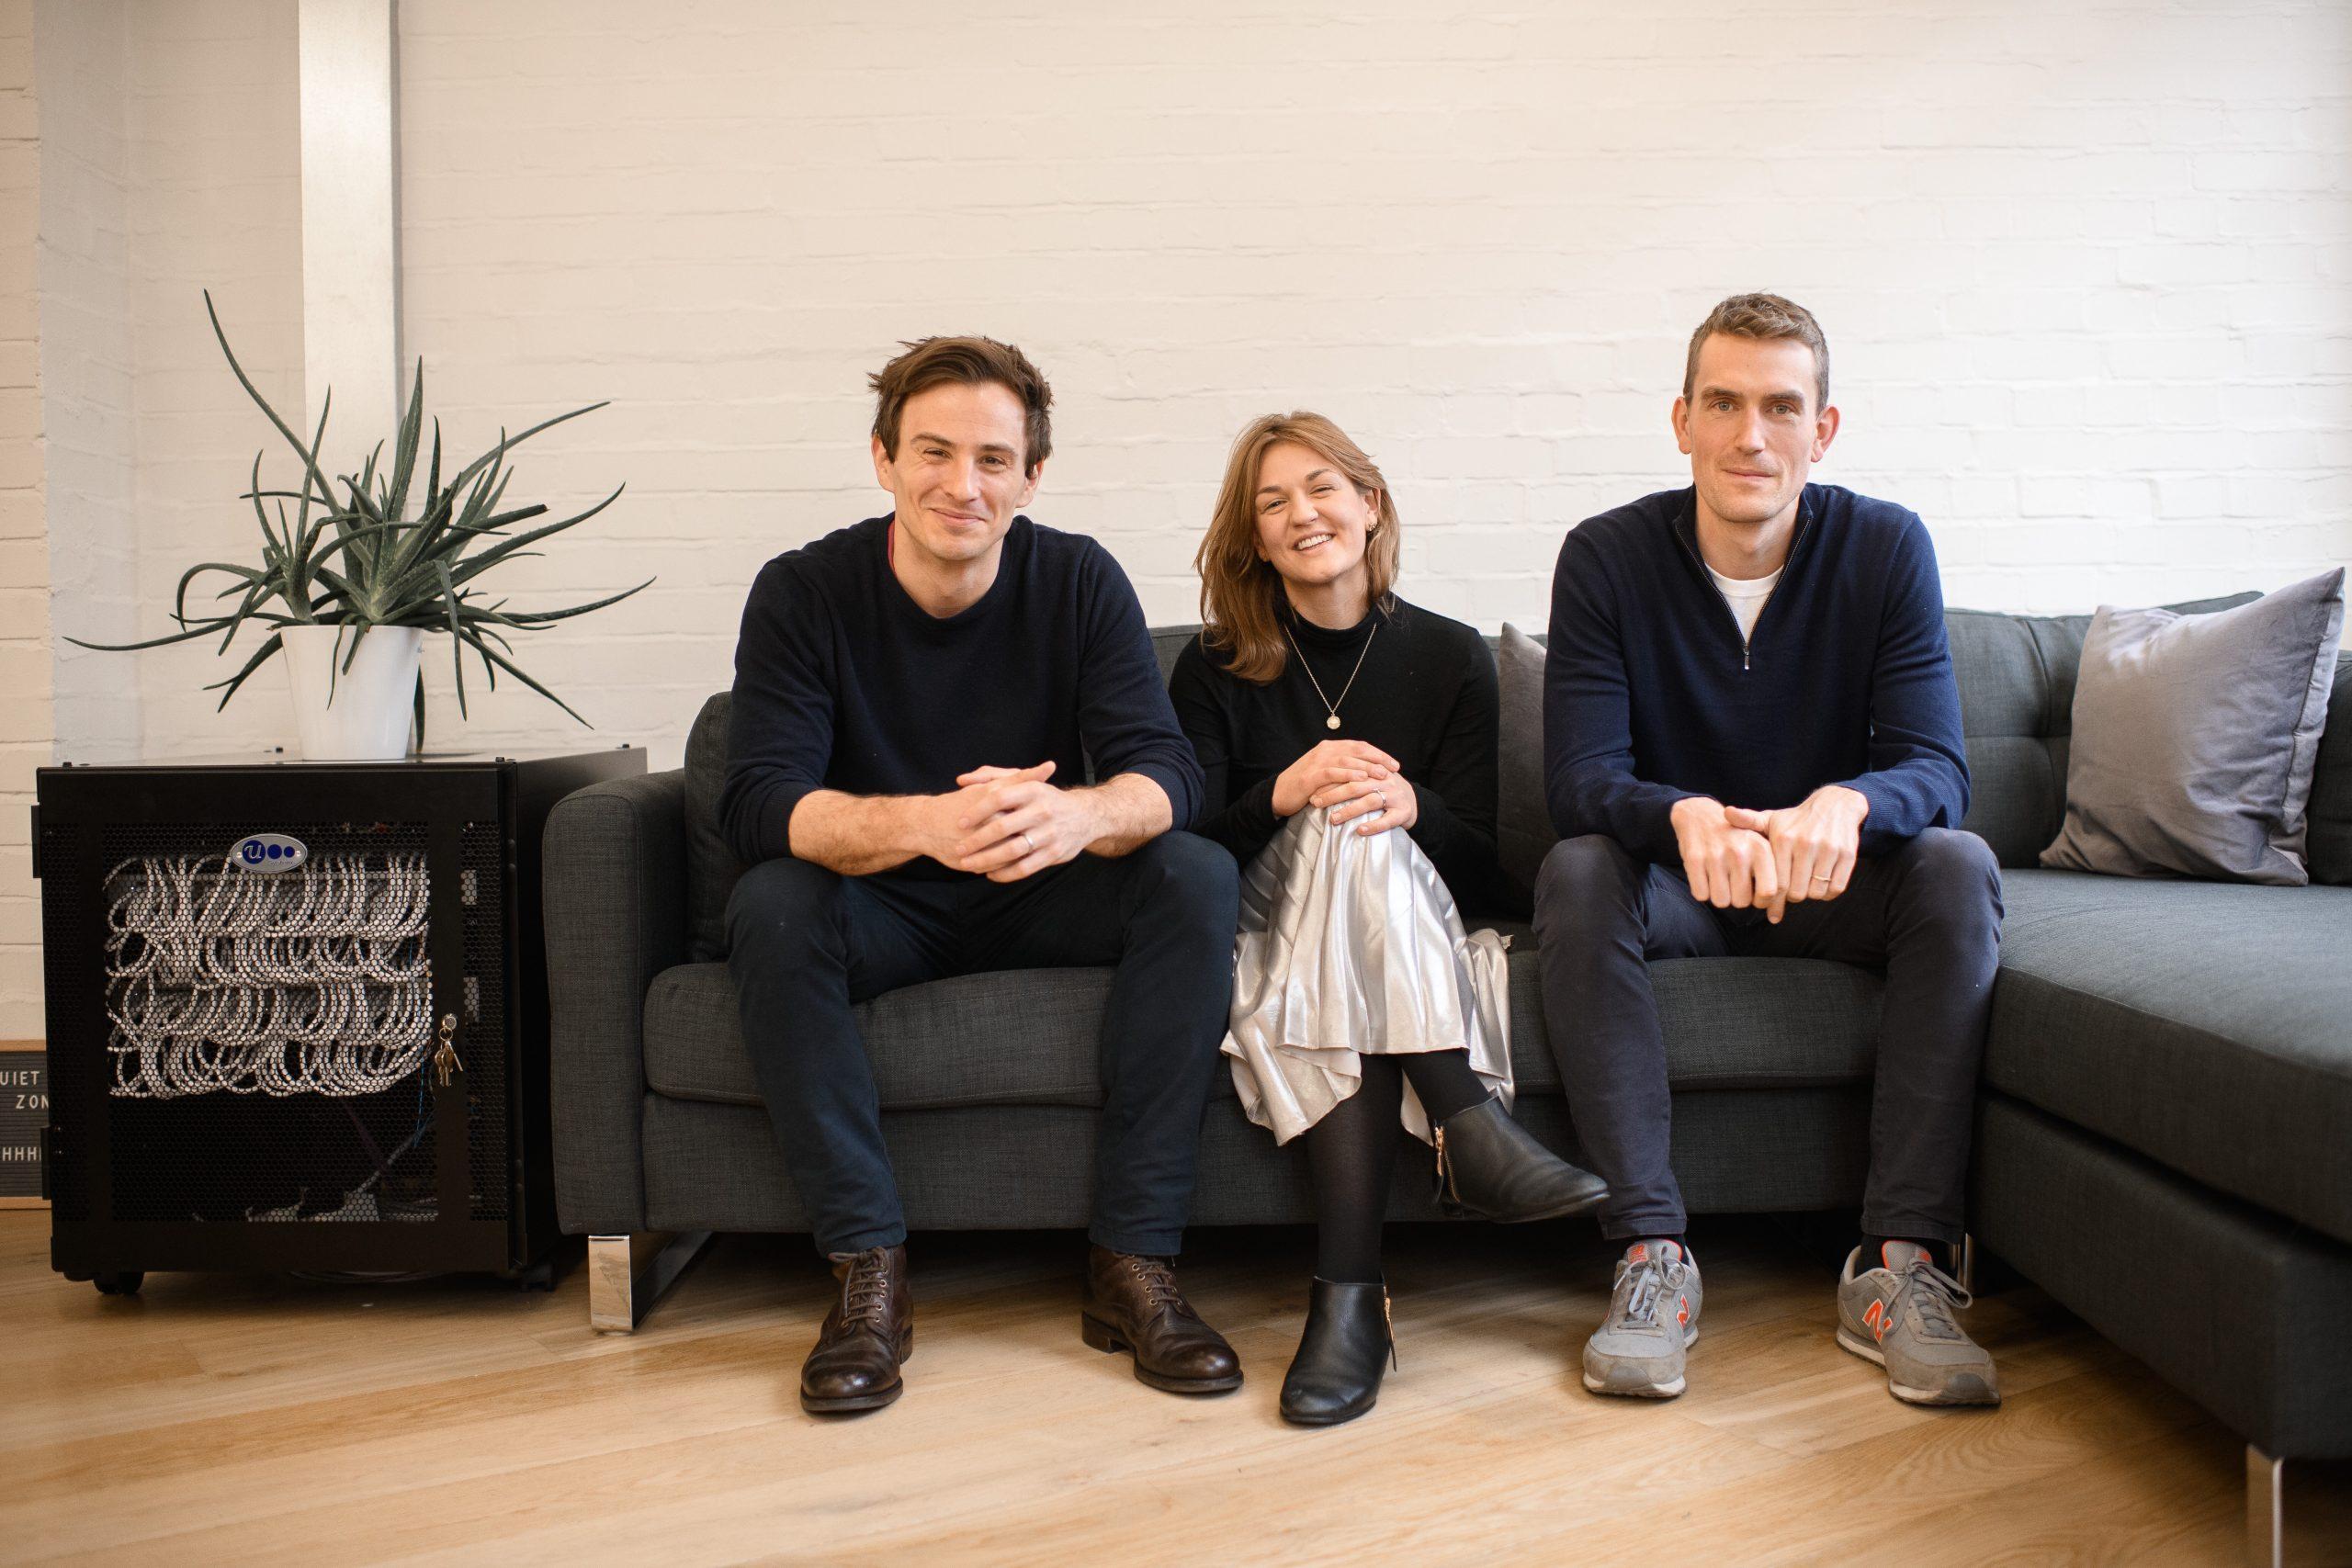 London startup Forward Health secures $5m as it rebrands to Pando - CityAM